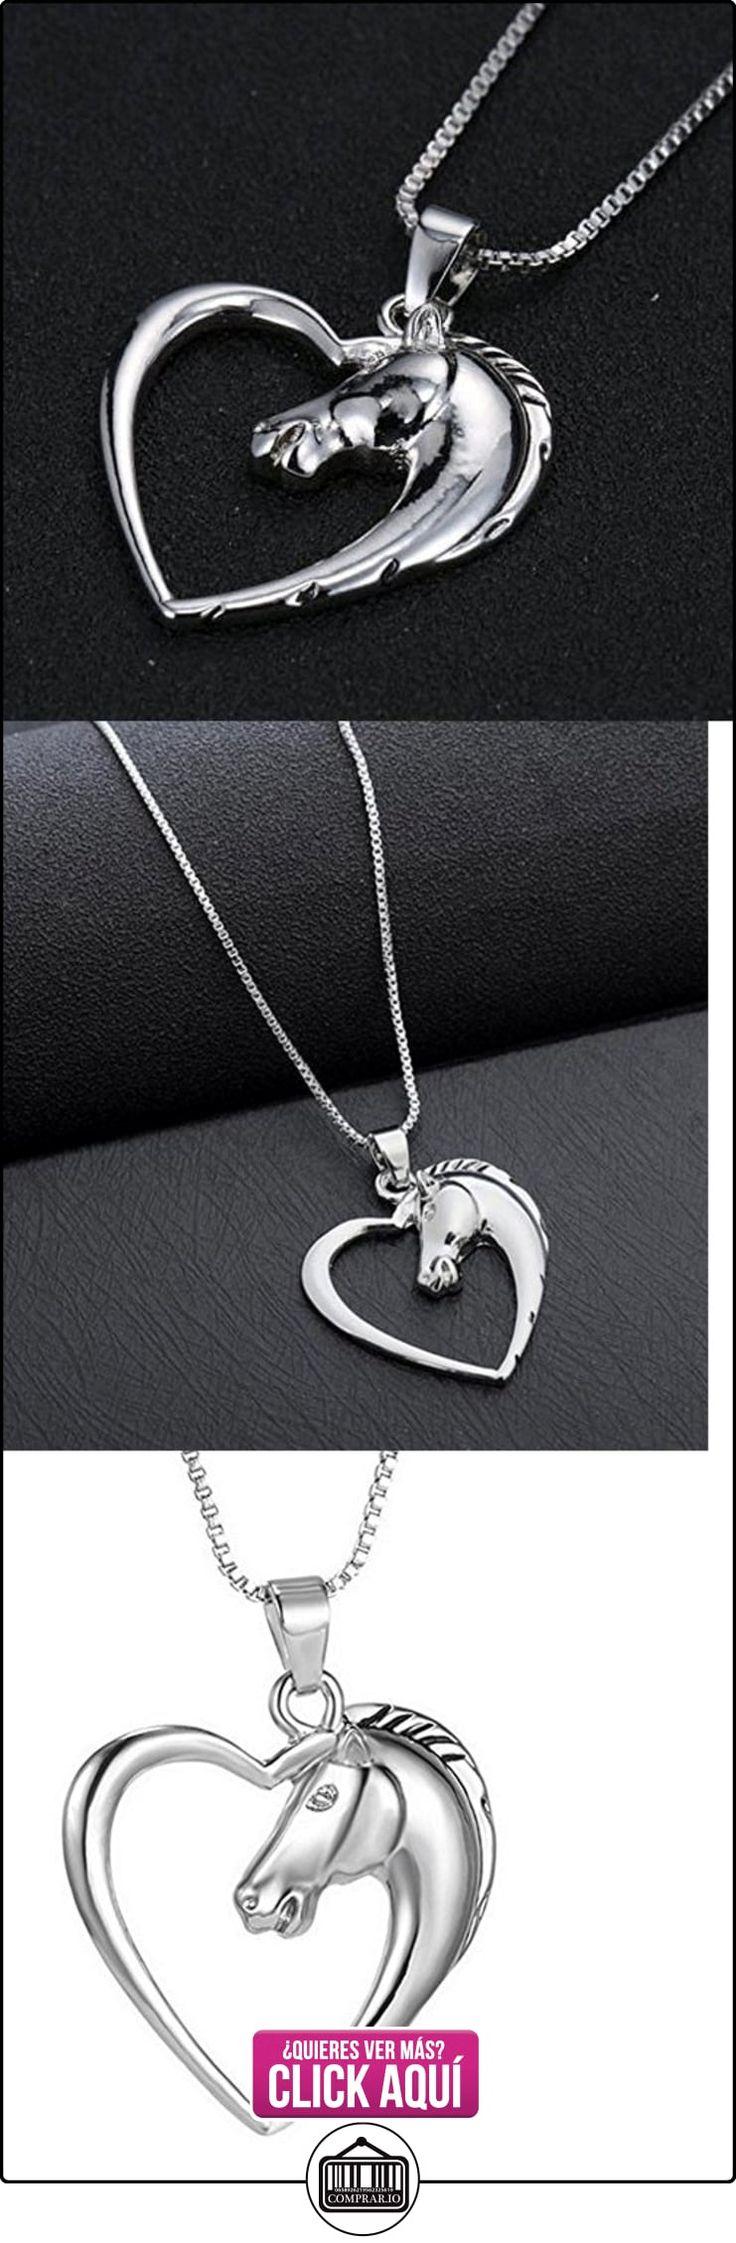 Collar, Colgante de cabeza de caballo de mujer con un corazón, 3x3 cm.  ✿ Joyas para mujer - Las mejores ofertas ✿ ▬► Ver oferta: http://comprar.io/goto/B01N93Z844